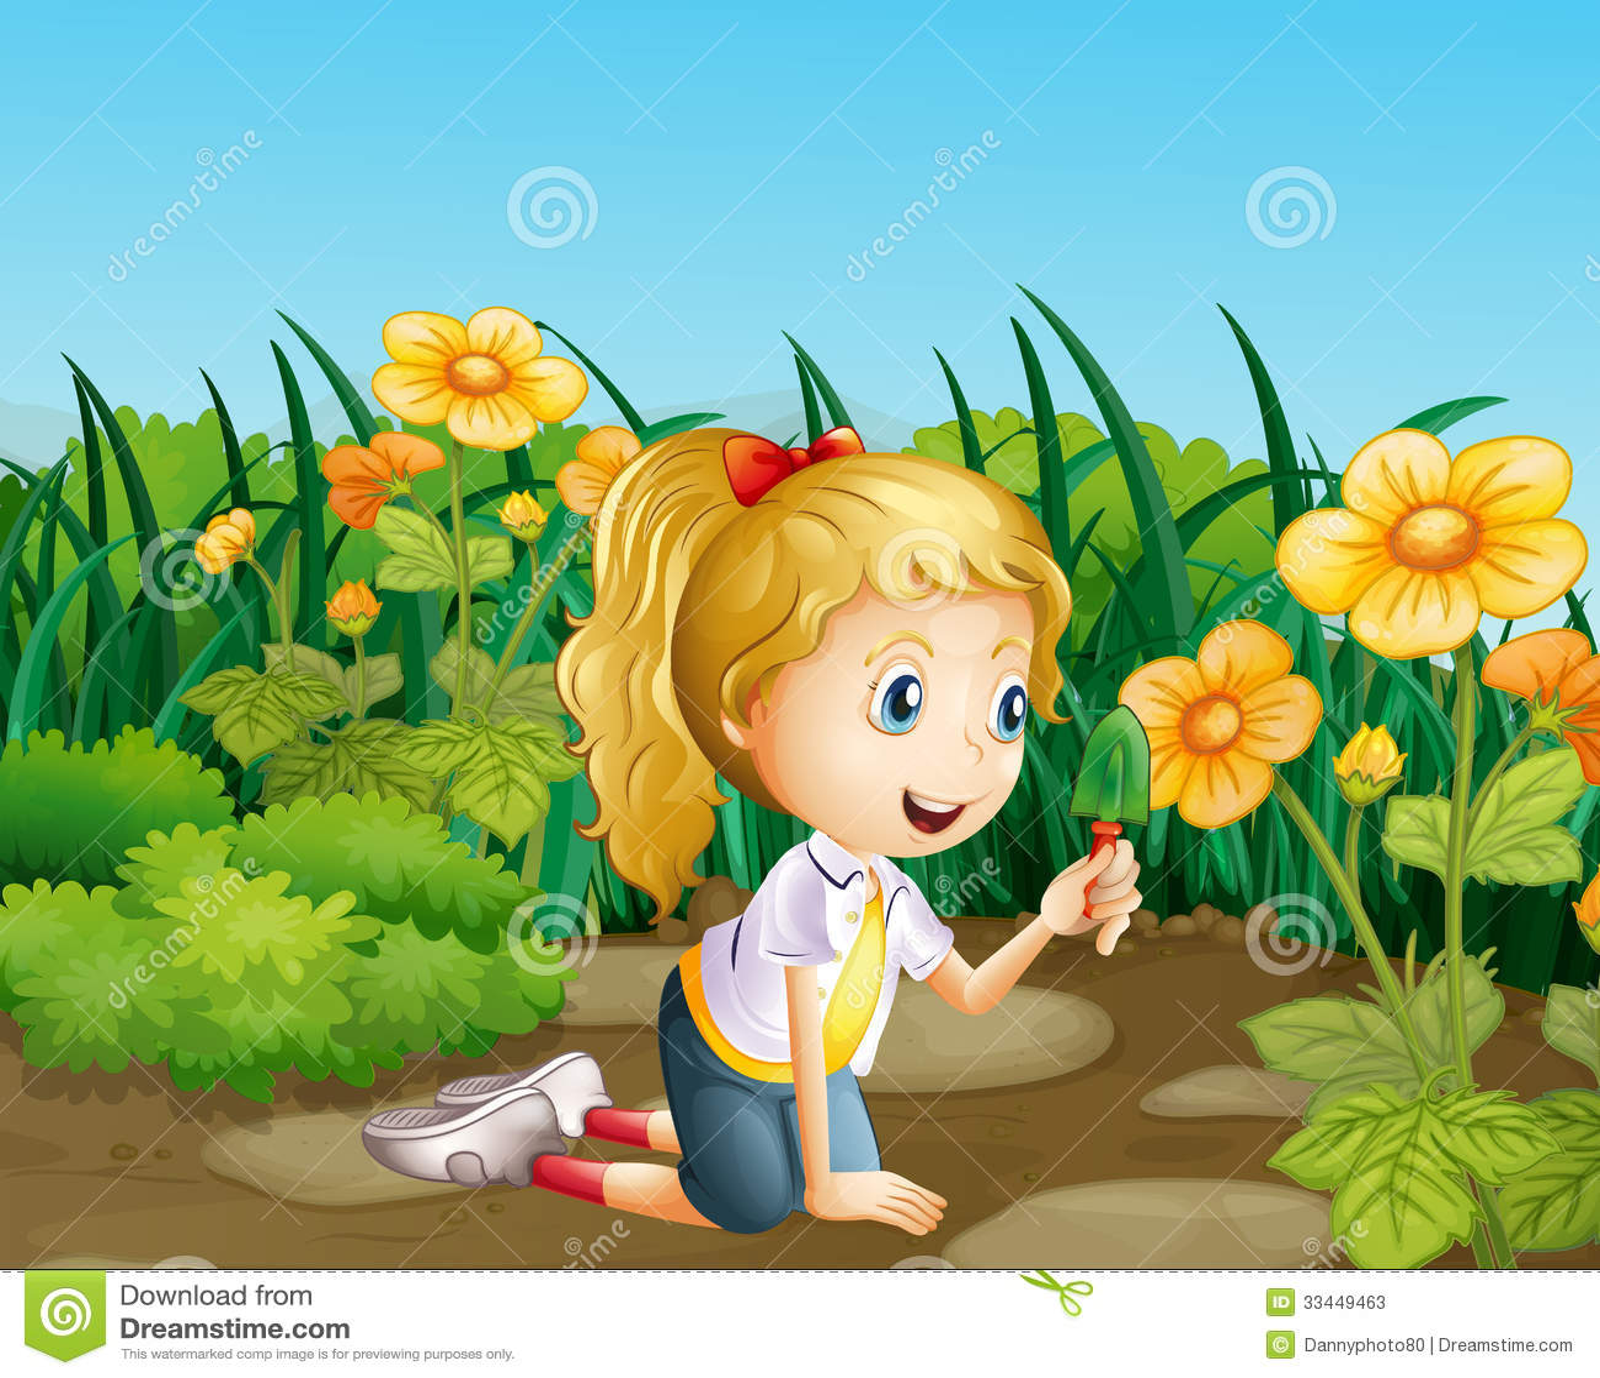 a girl in the garden holding a shovel - The Girls In The Garden